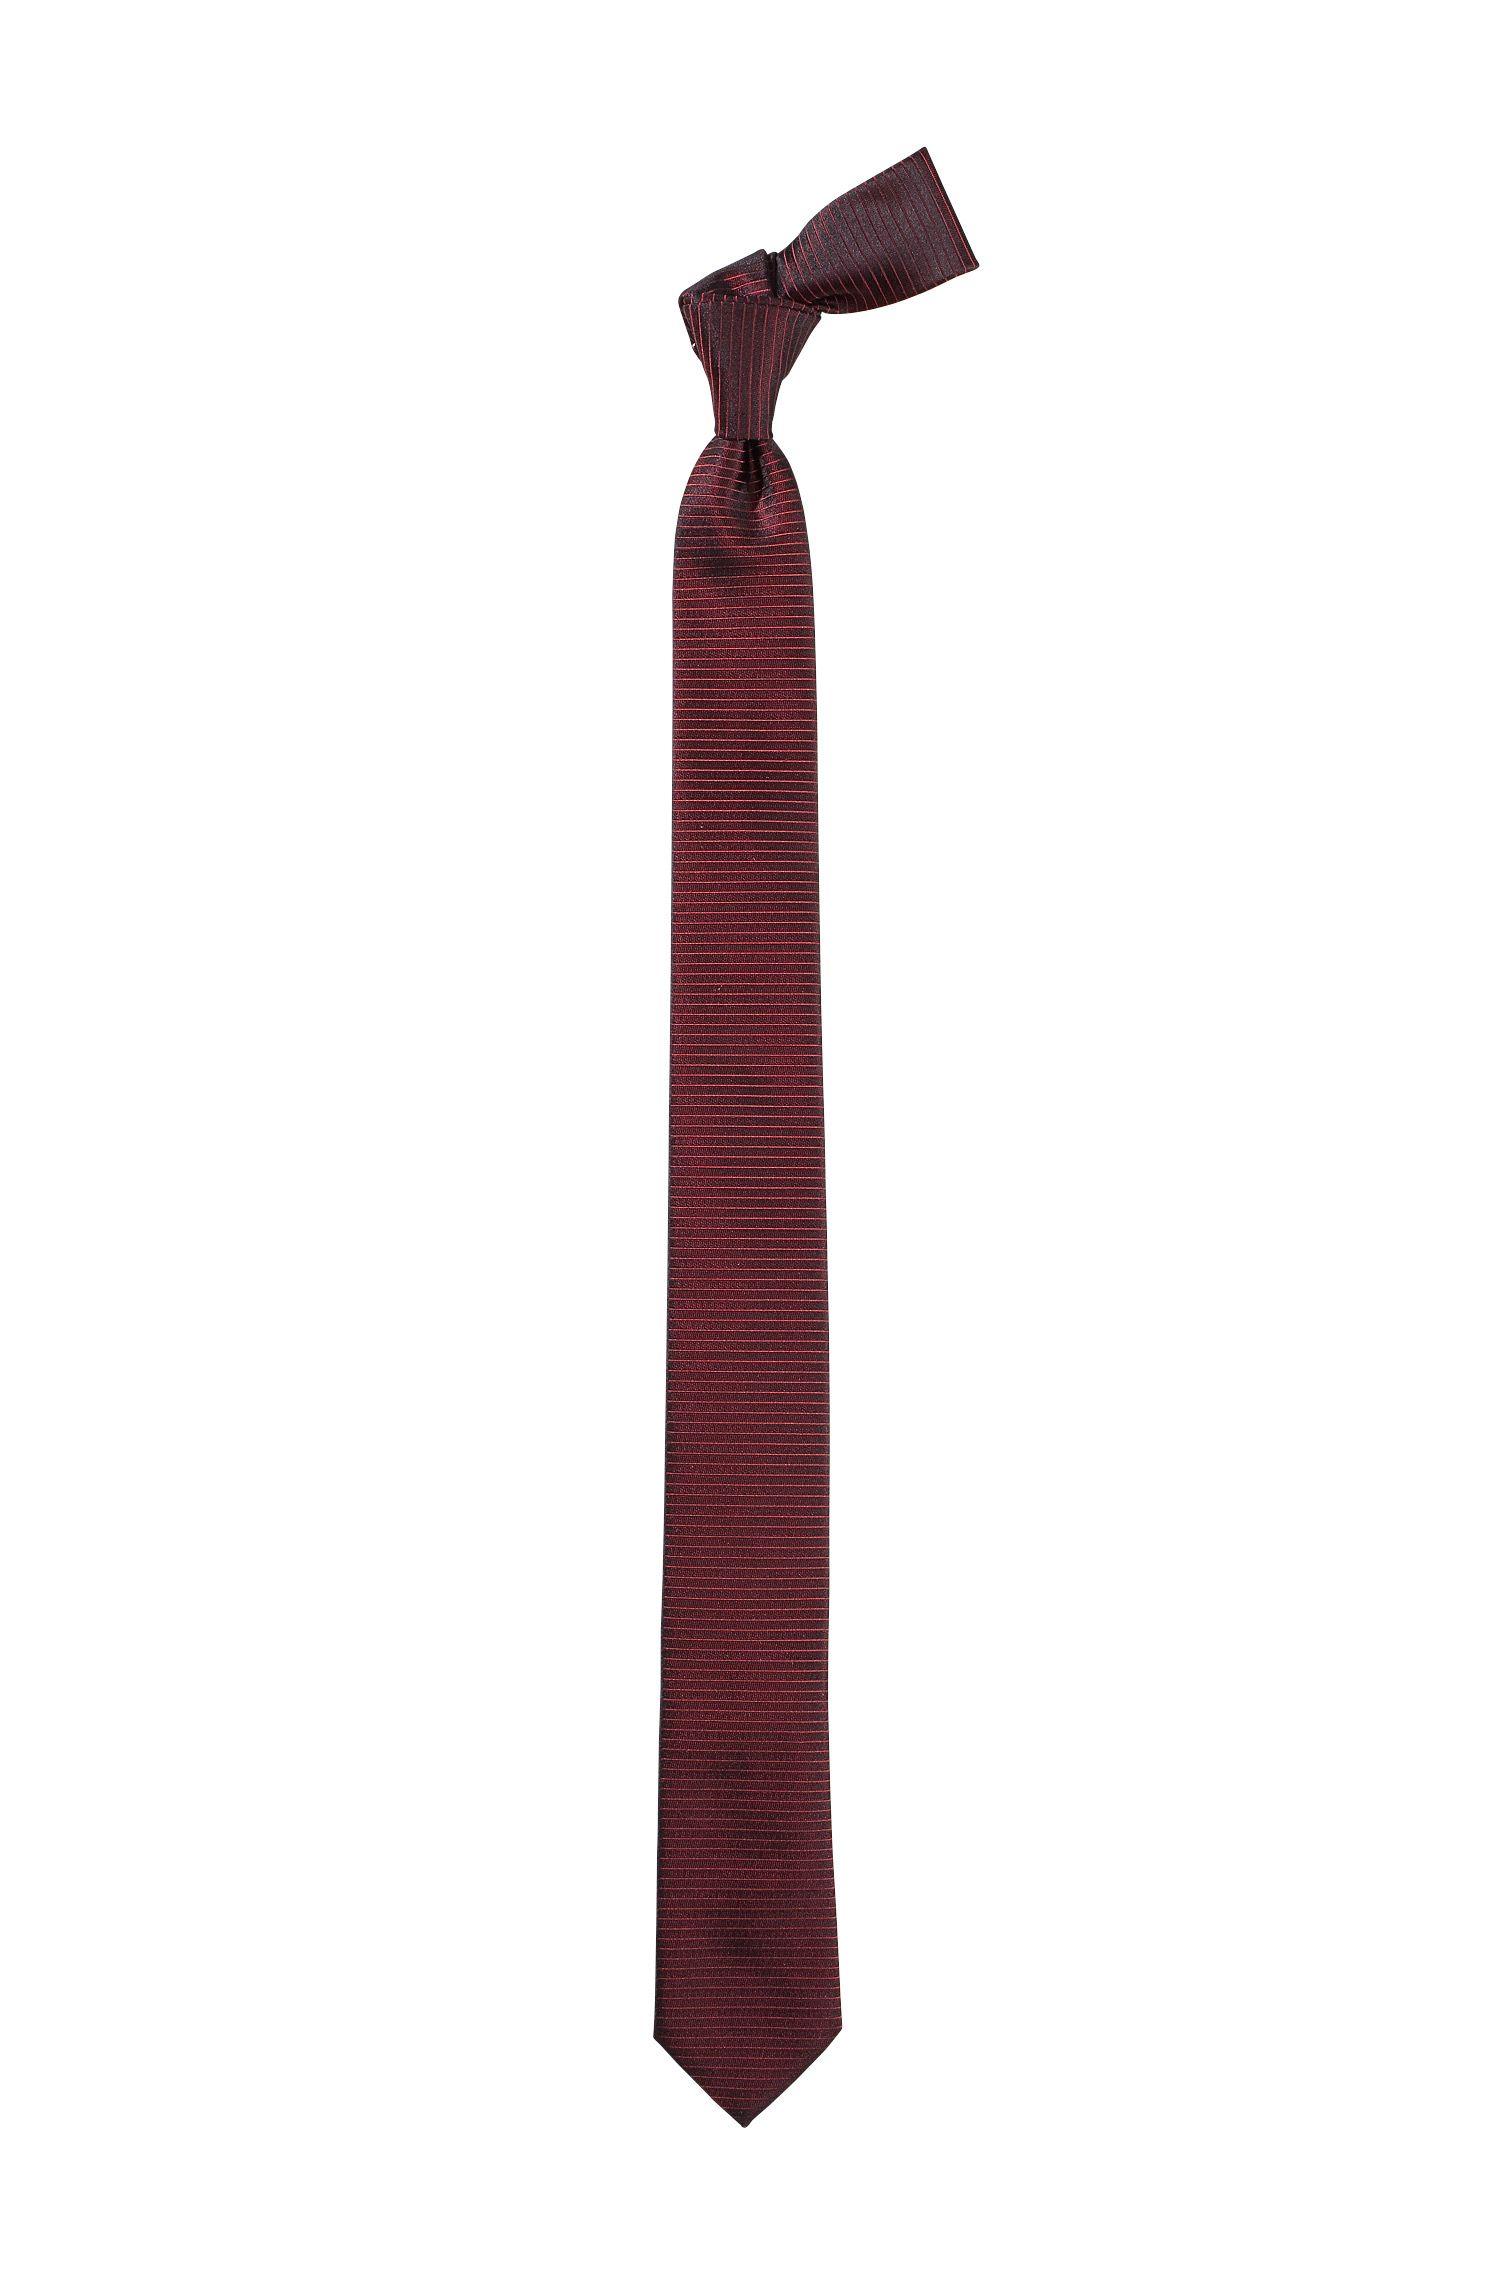 Krawatte ´TIE CM 4,5` aus Seide